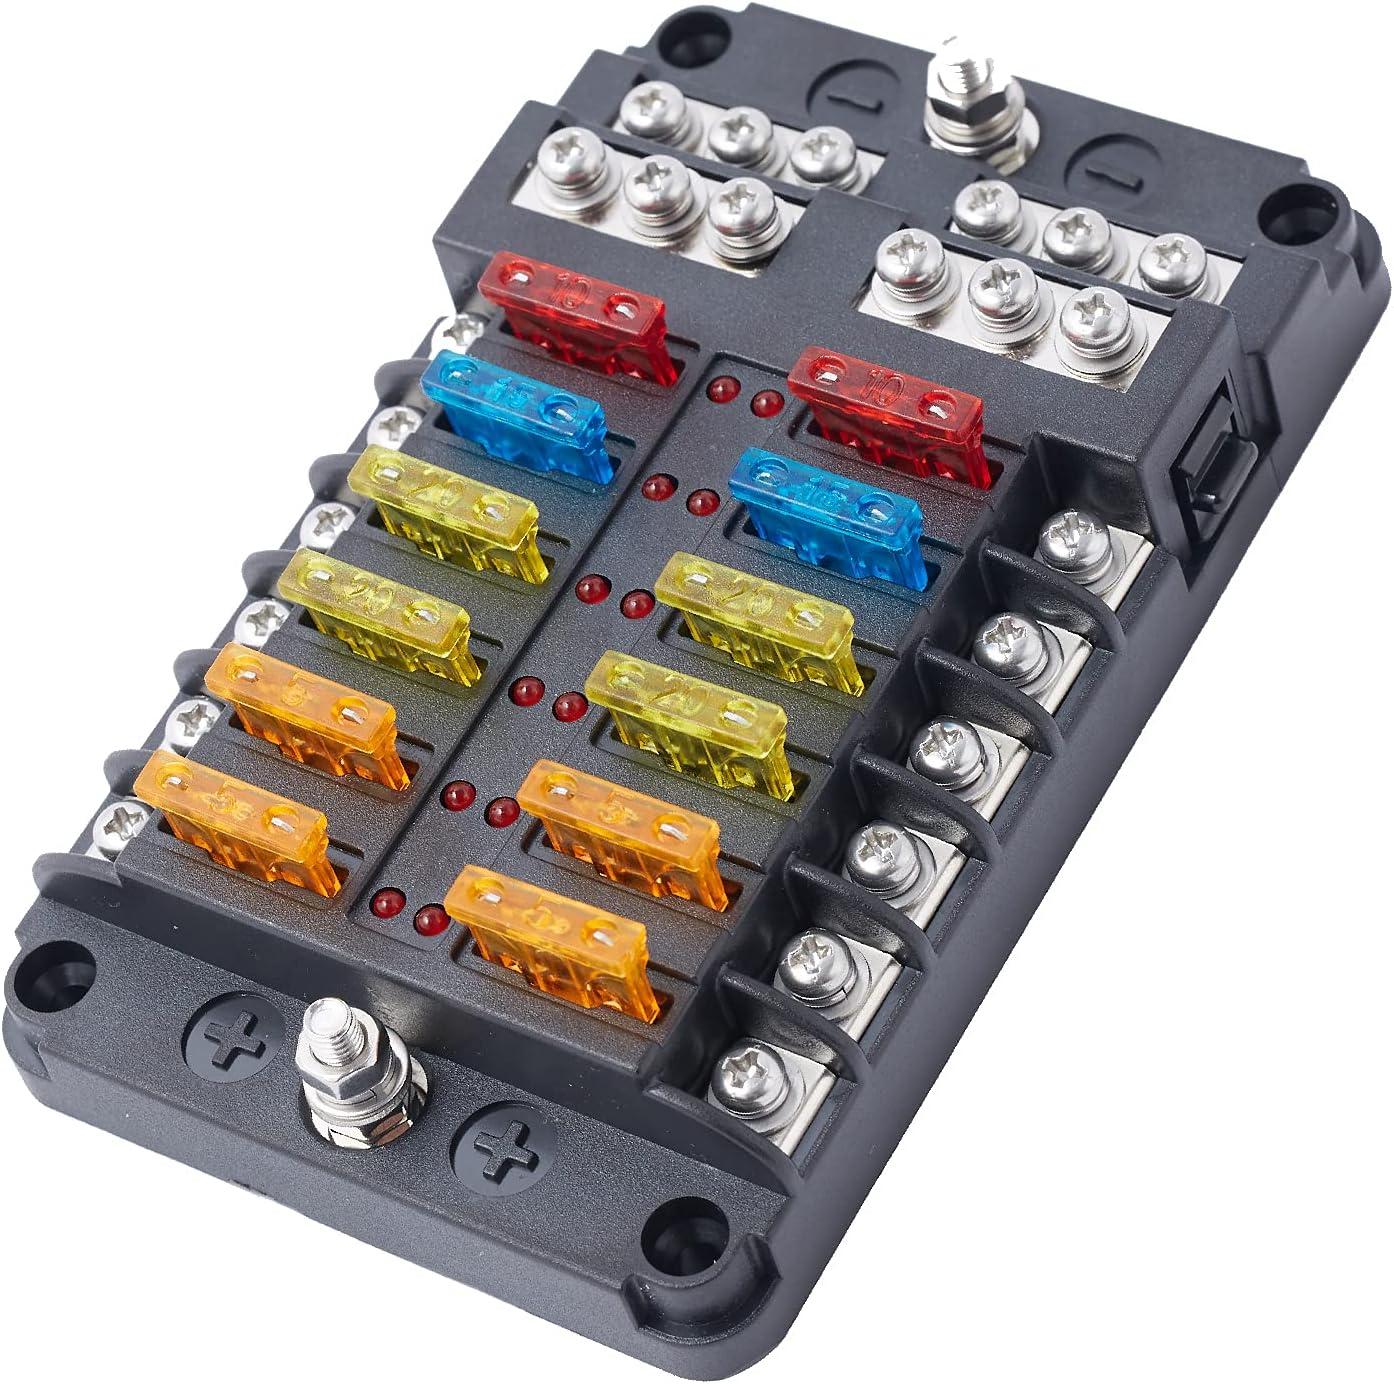 buy 12 ways blade fuse box 12 volt fuse block 12 circuit negative bus with  led warning indicator damp-proof cover for 12v/24v automotive car boat bus  touring car (with 24 pcs fuses)  ubuy